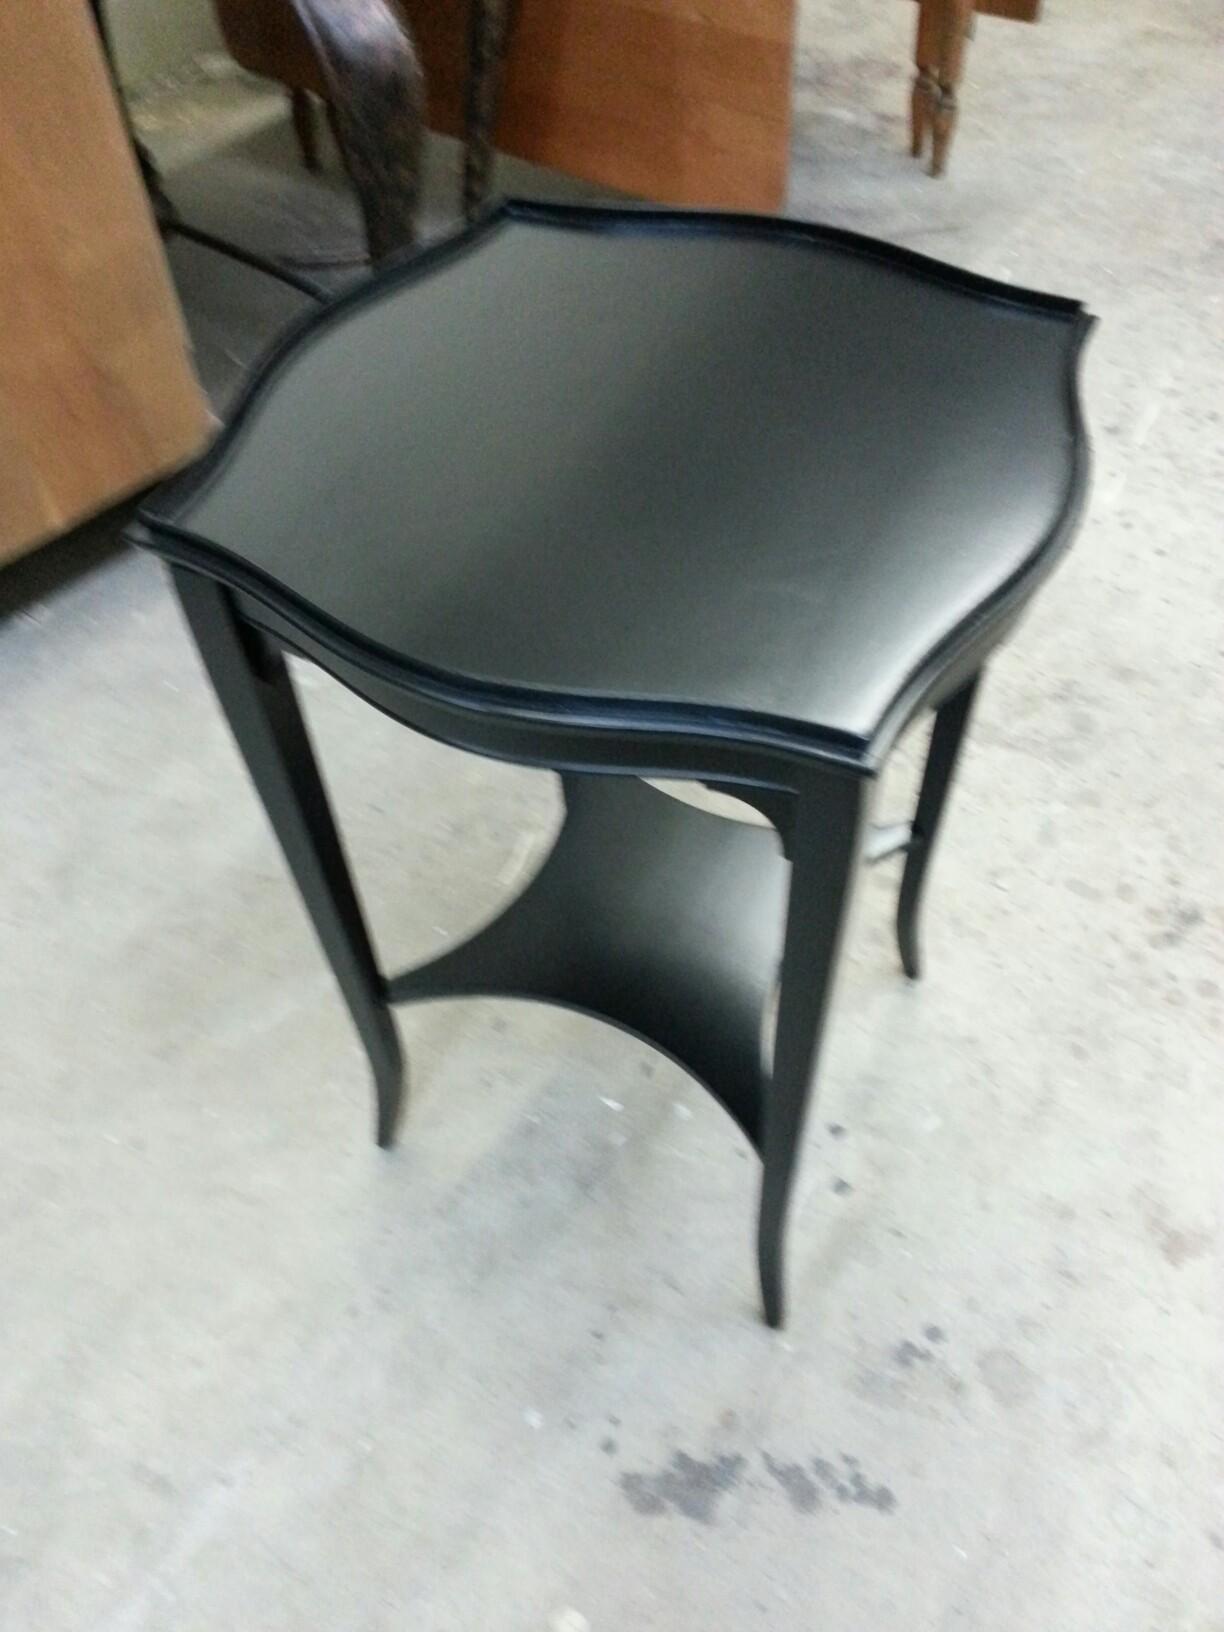 Bon McCracken Furniture Repair 8123 Laurel Bend Dr, Memphis, TN 38125   YP.com